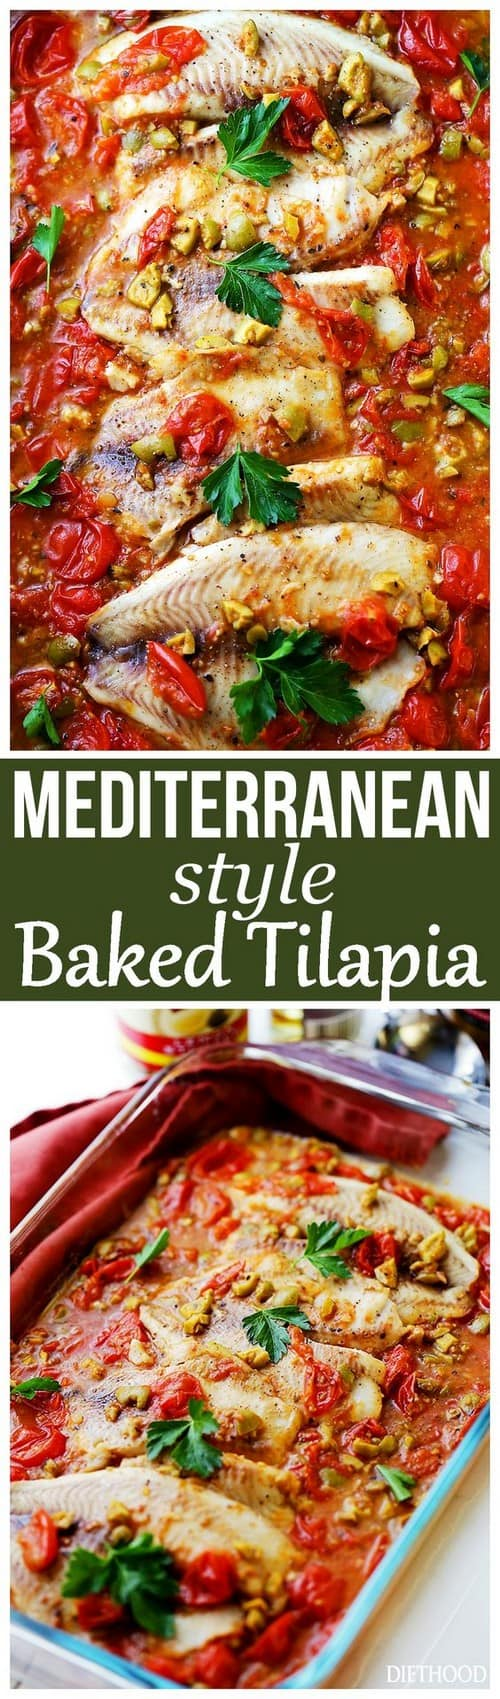 Mediterranean Style Baked Tilapia